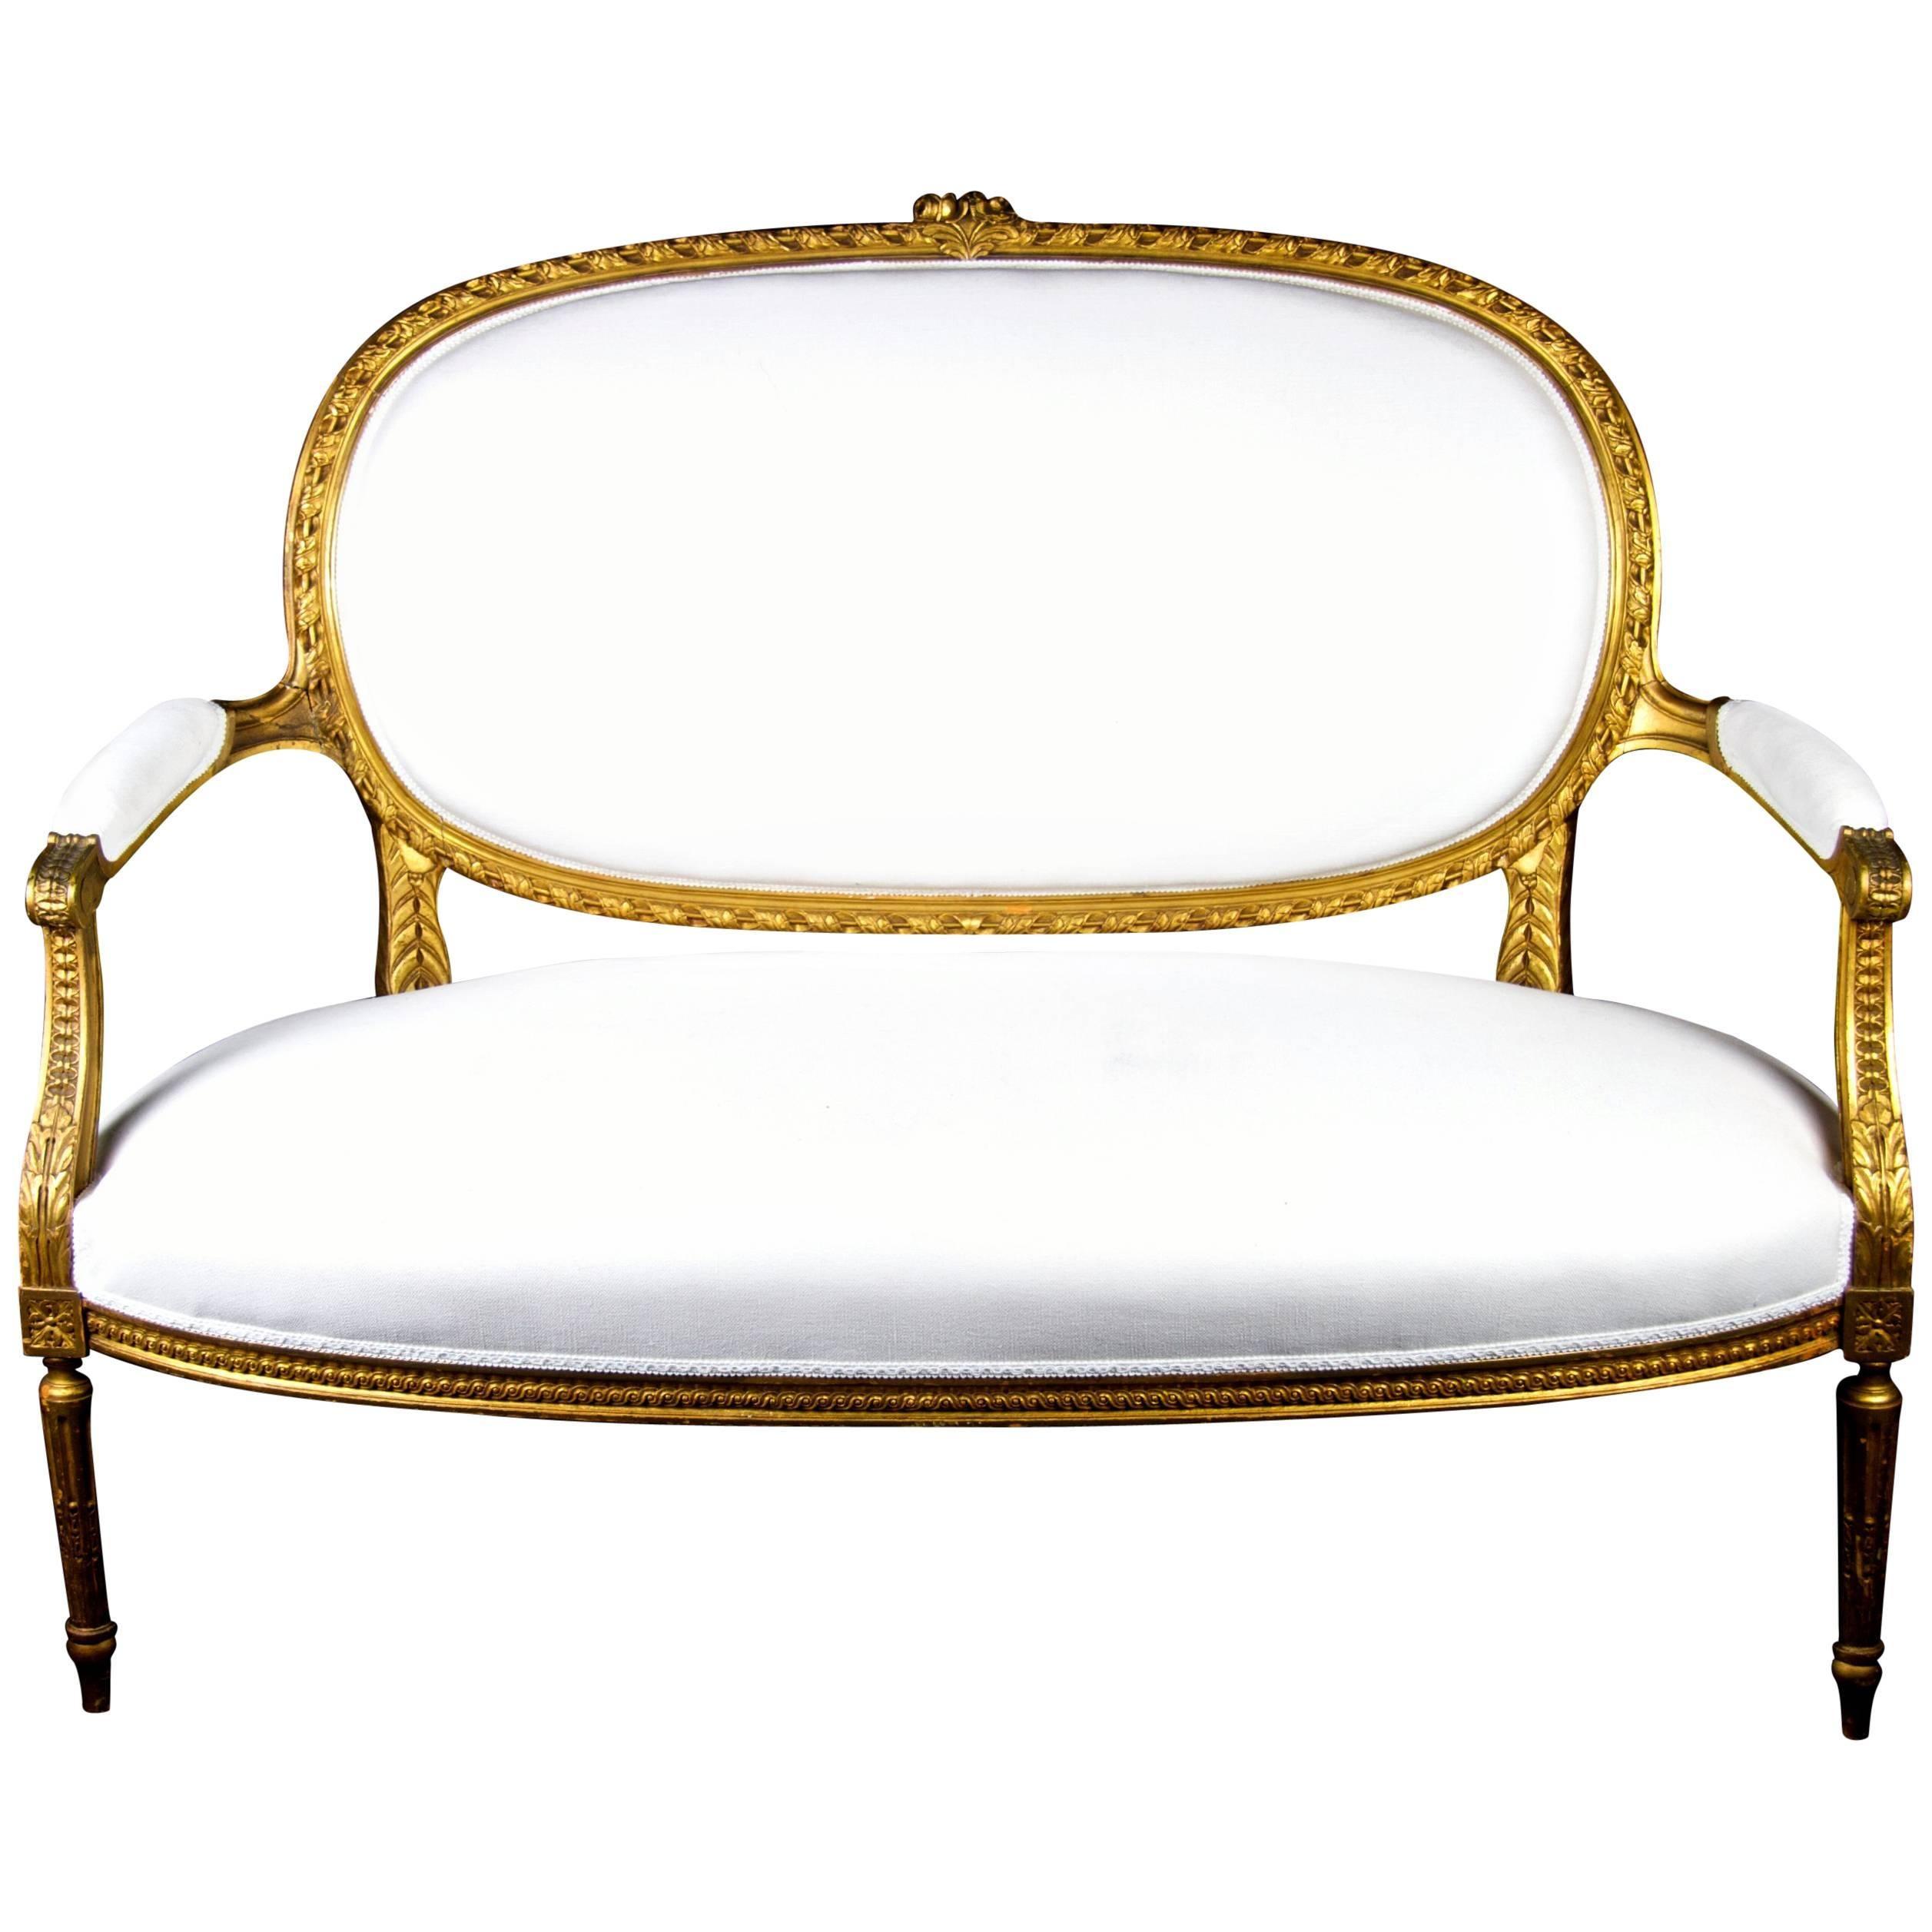 Mid 19th Century Antique Swedish Gustavian Gilt Carving Sprung Sofa Loveseat